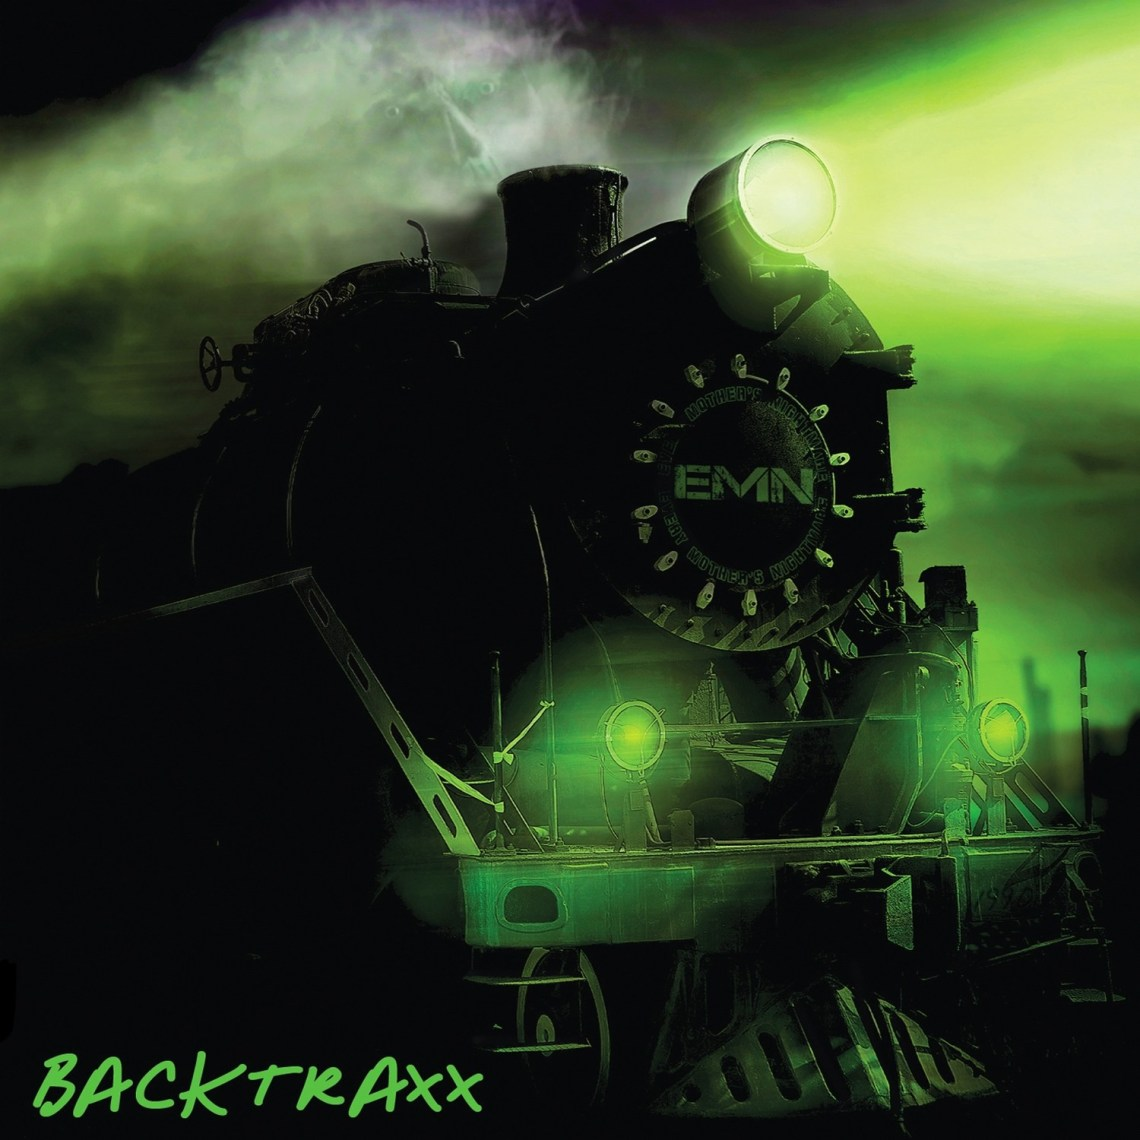 Backtraxx (Reissue)